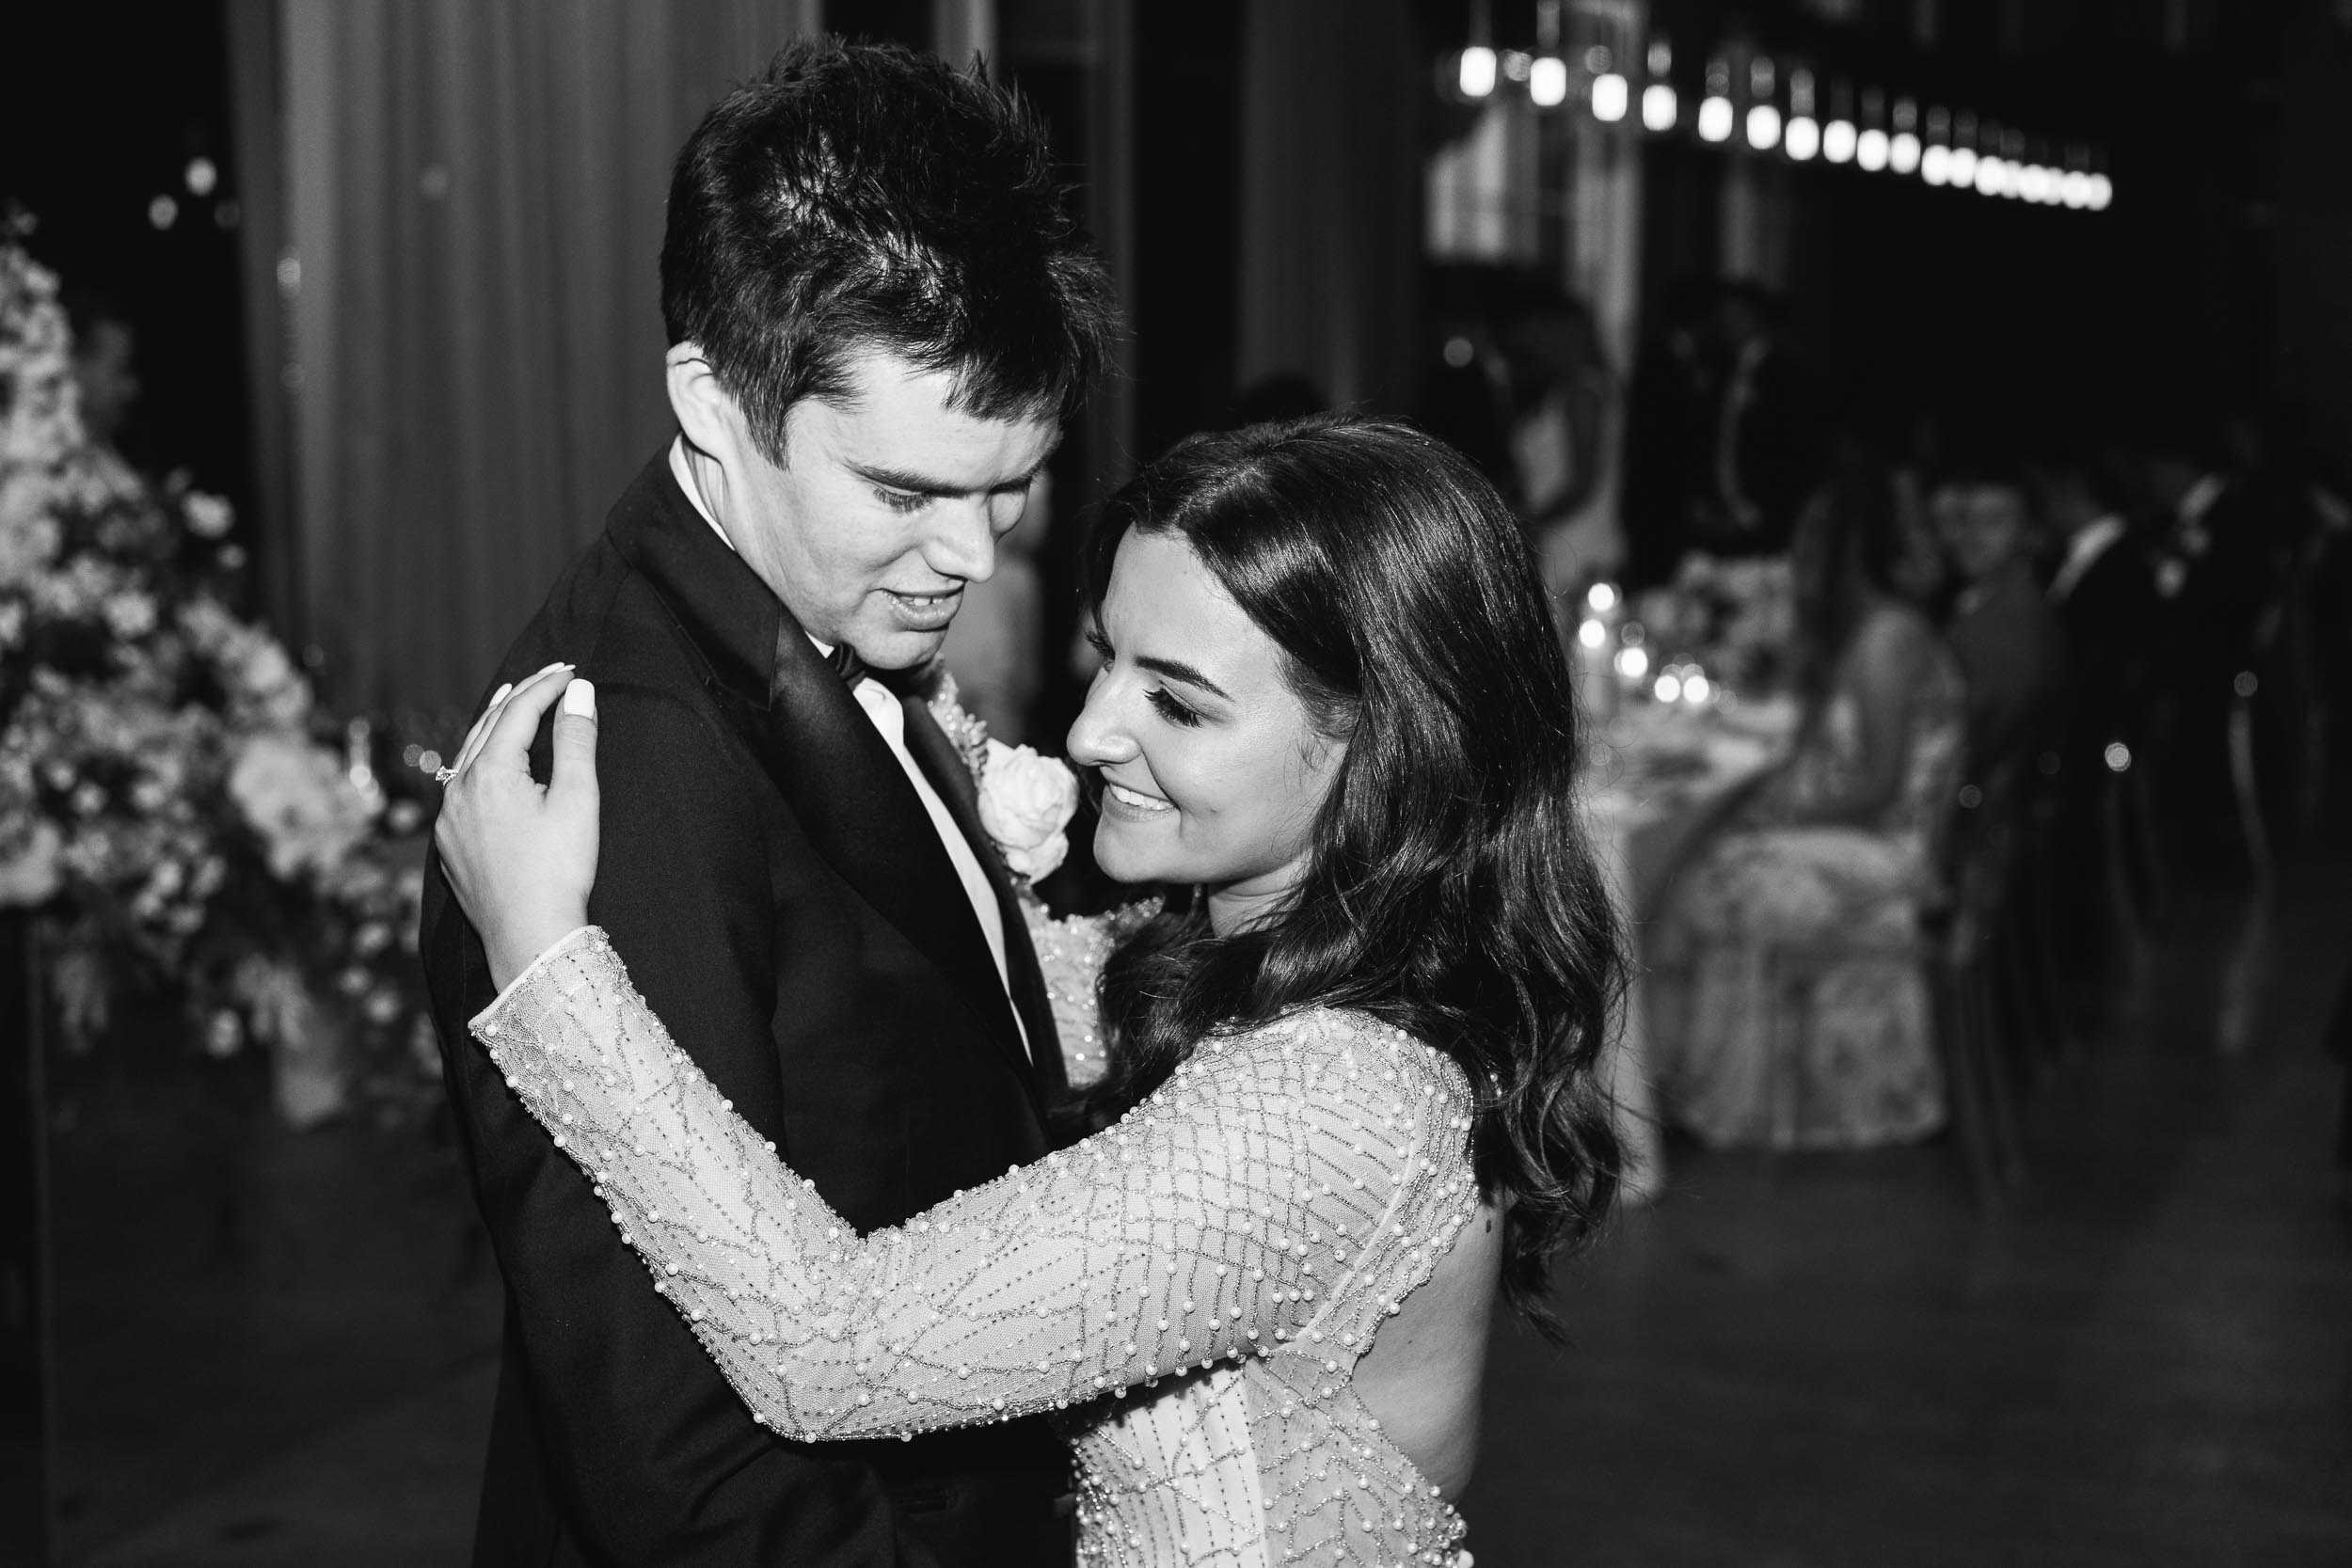 Kas-Richards-Wedding-Photographer-Melbourne-City-Wedding-Alto-Event-Space-Jane-Hill-Bridal-Gown-70.jpg